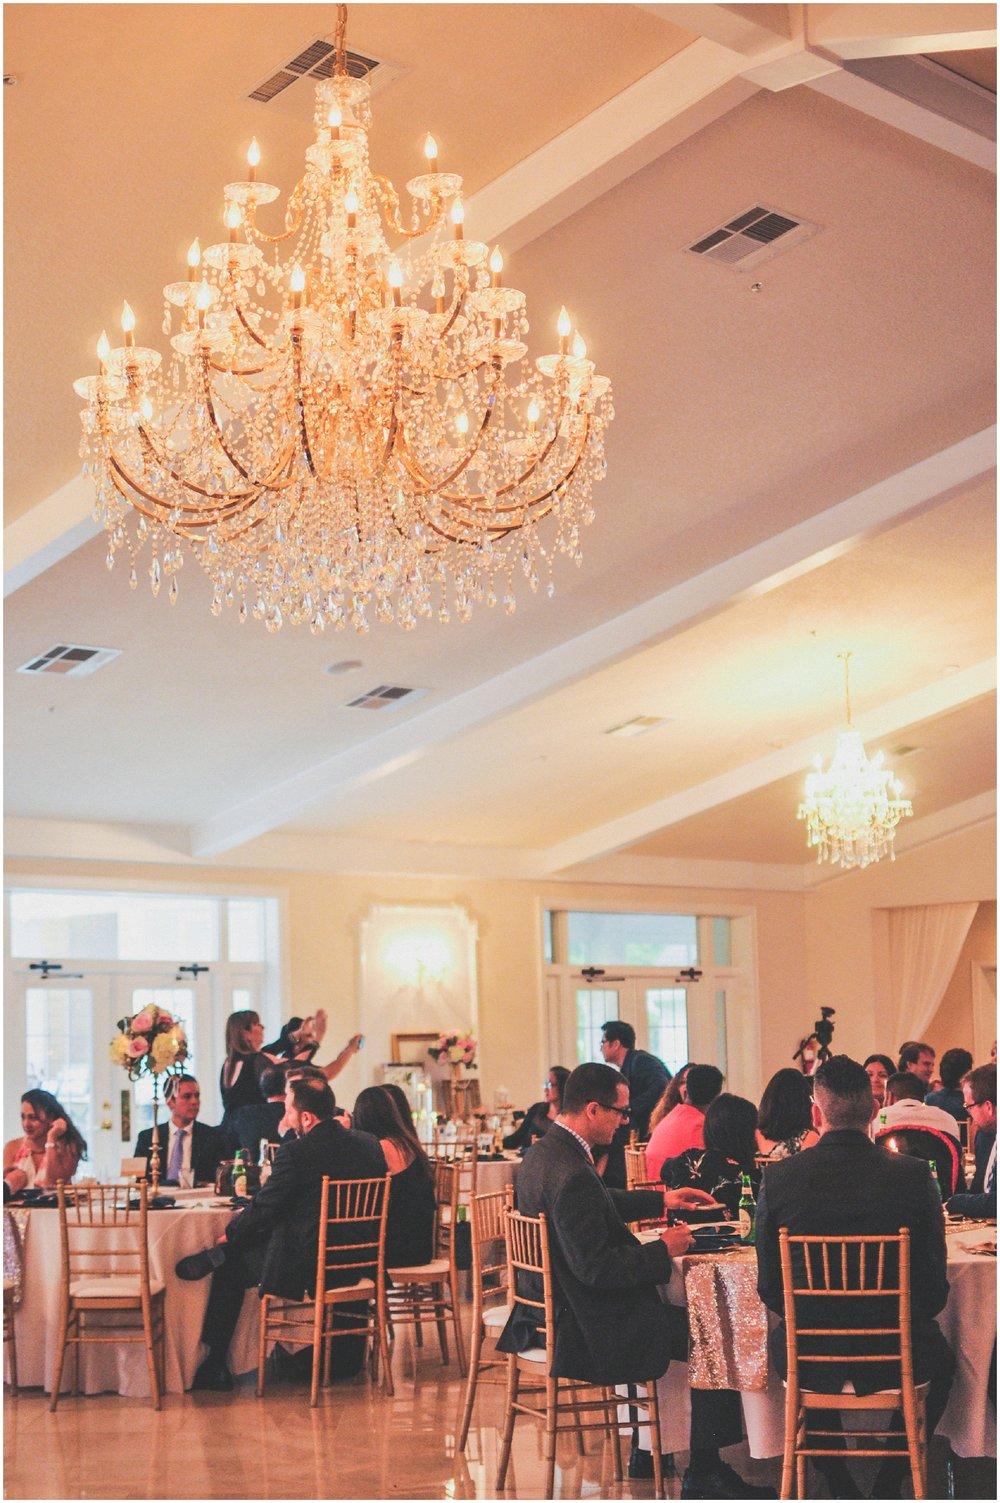 Rustic-Elegant-Wedding-Venue-in-Tampa-Stonebridge-Events_0444.jpg